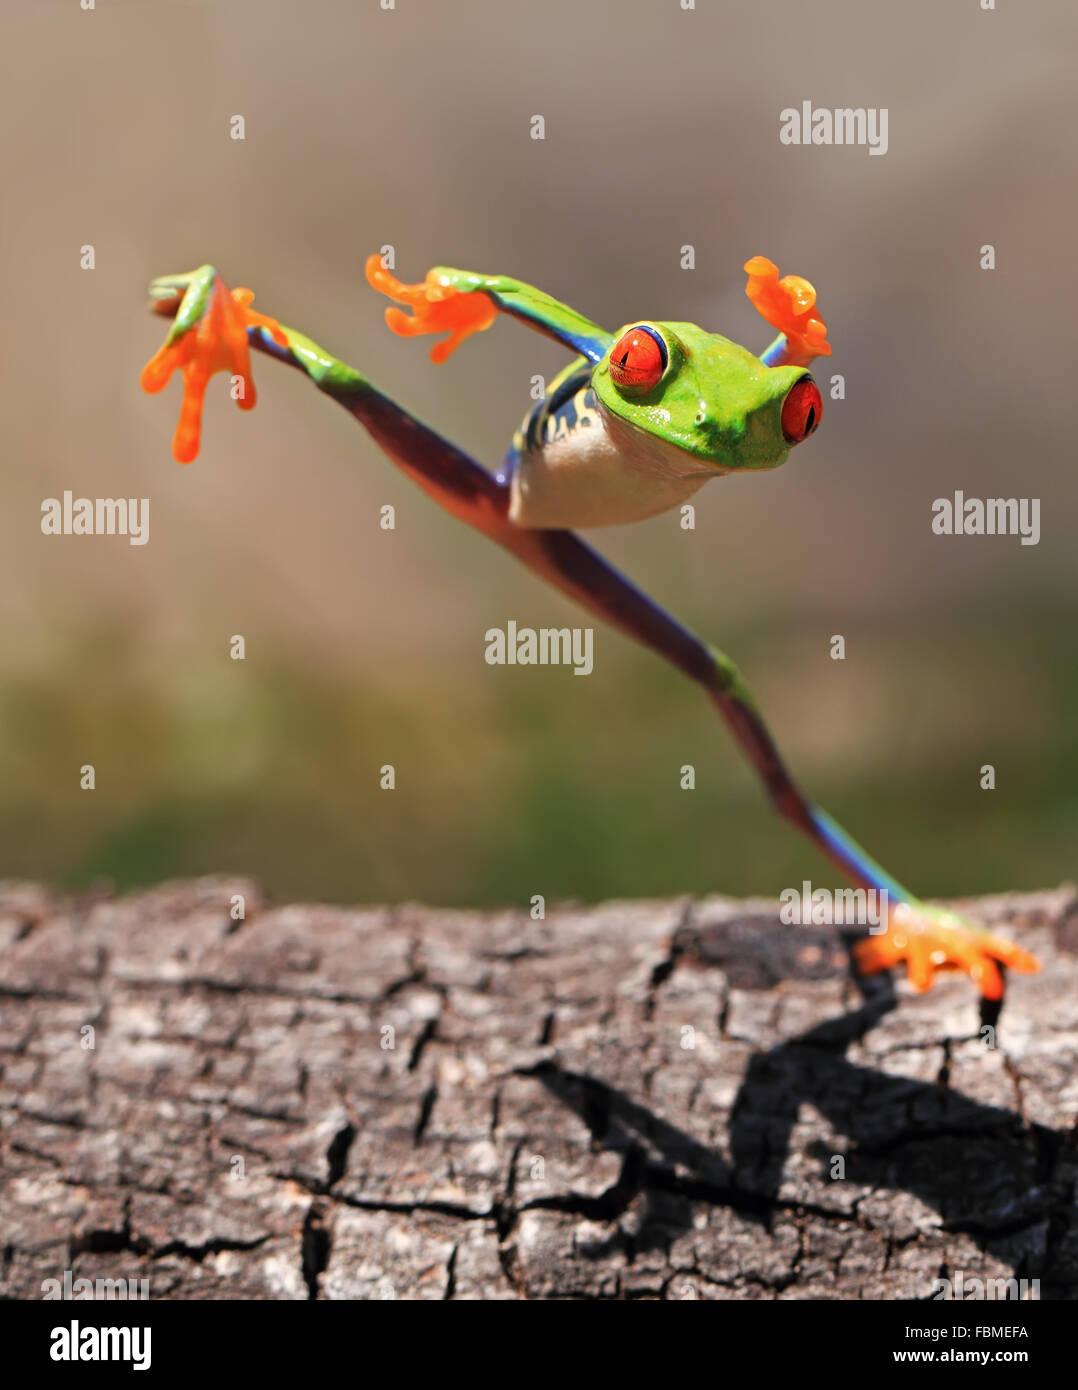 Red eye tree frog (agalychnis callidryas) standing on one leg, Riau Islands, Indonesia - Stock Image